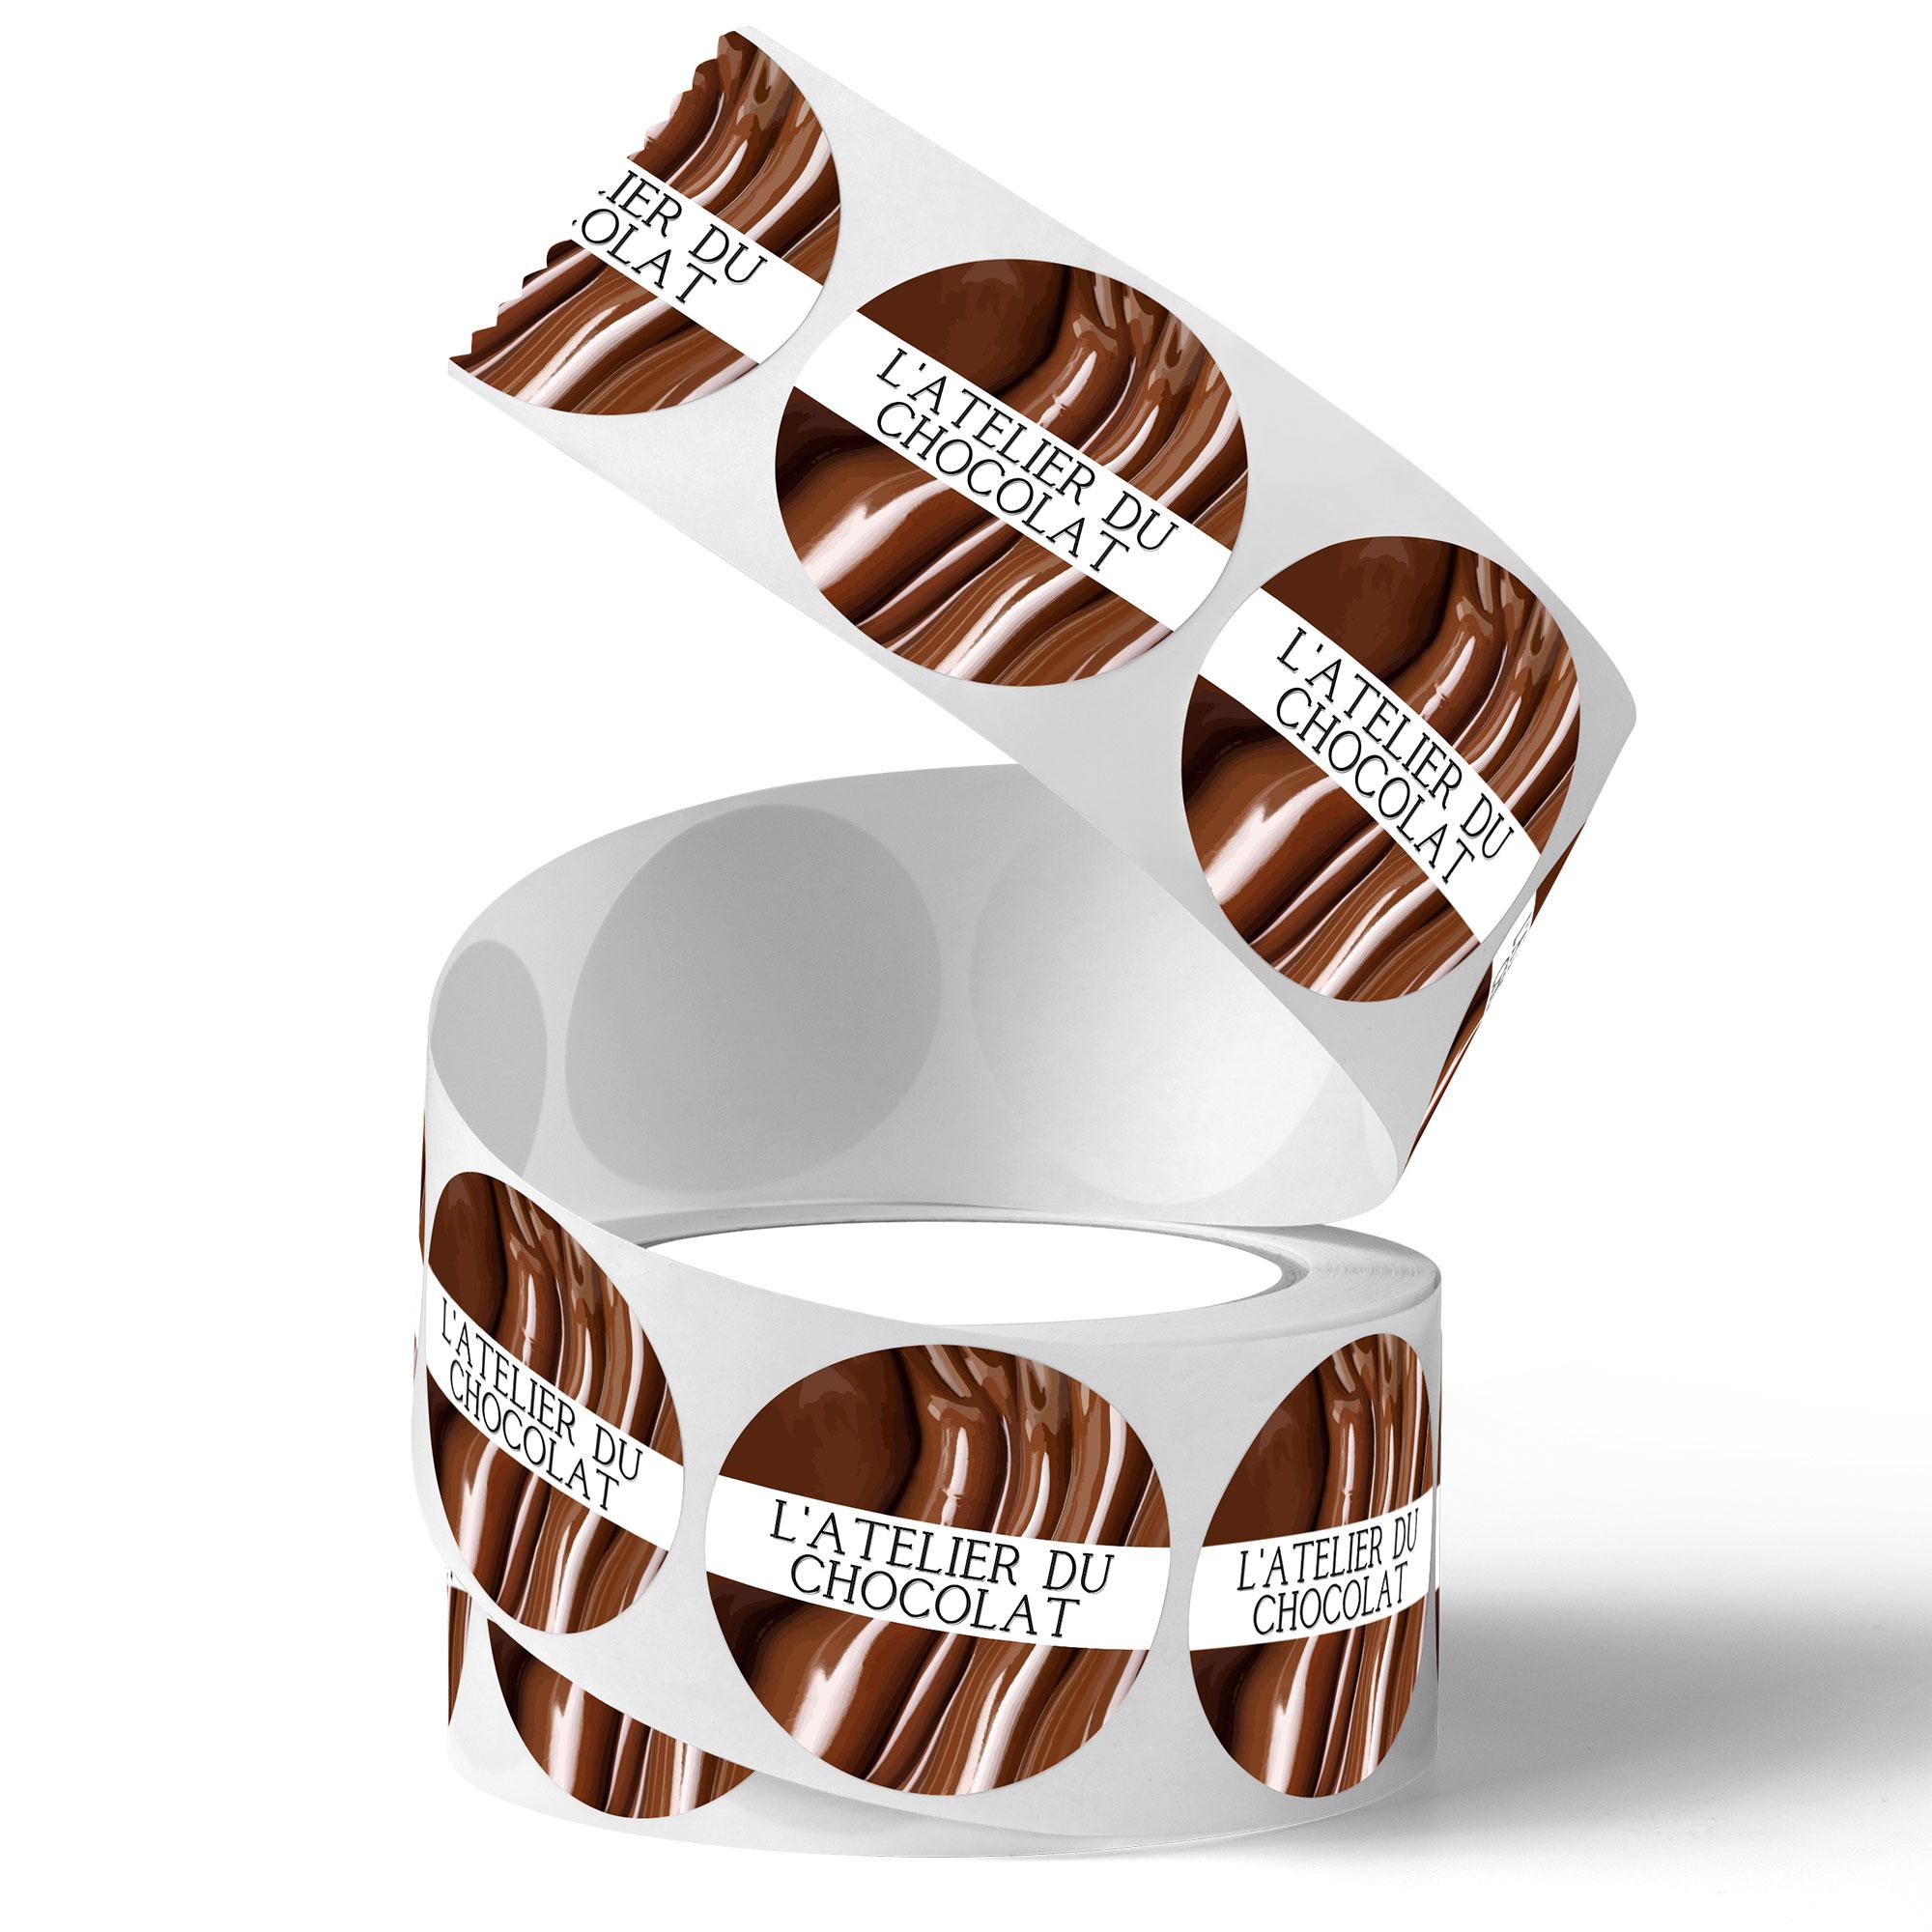 etiquettes pose manuelle chocolat